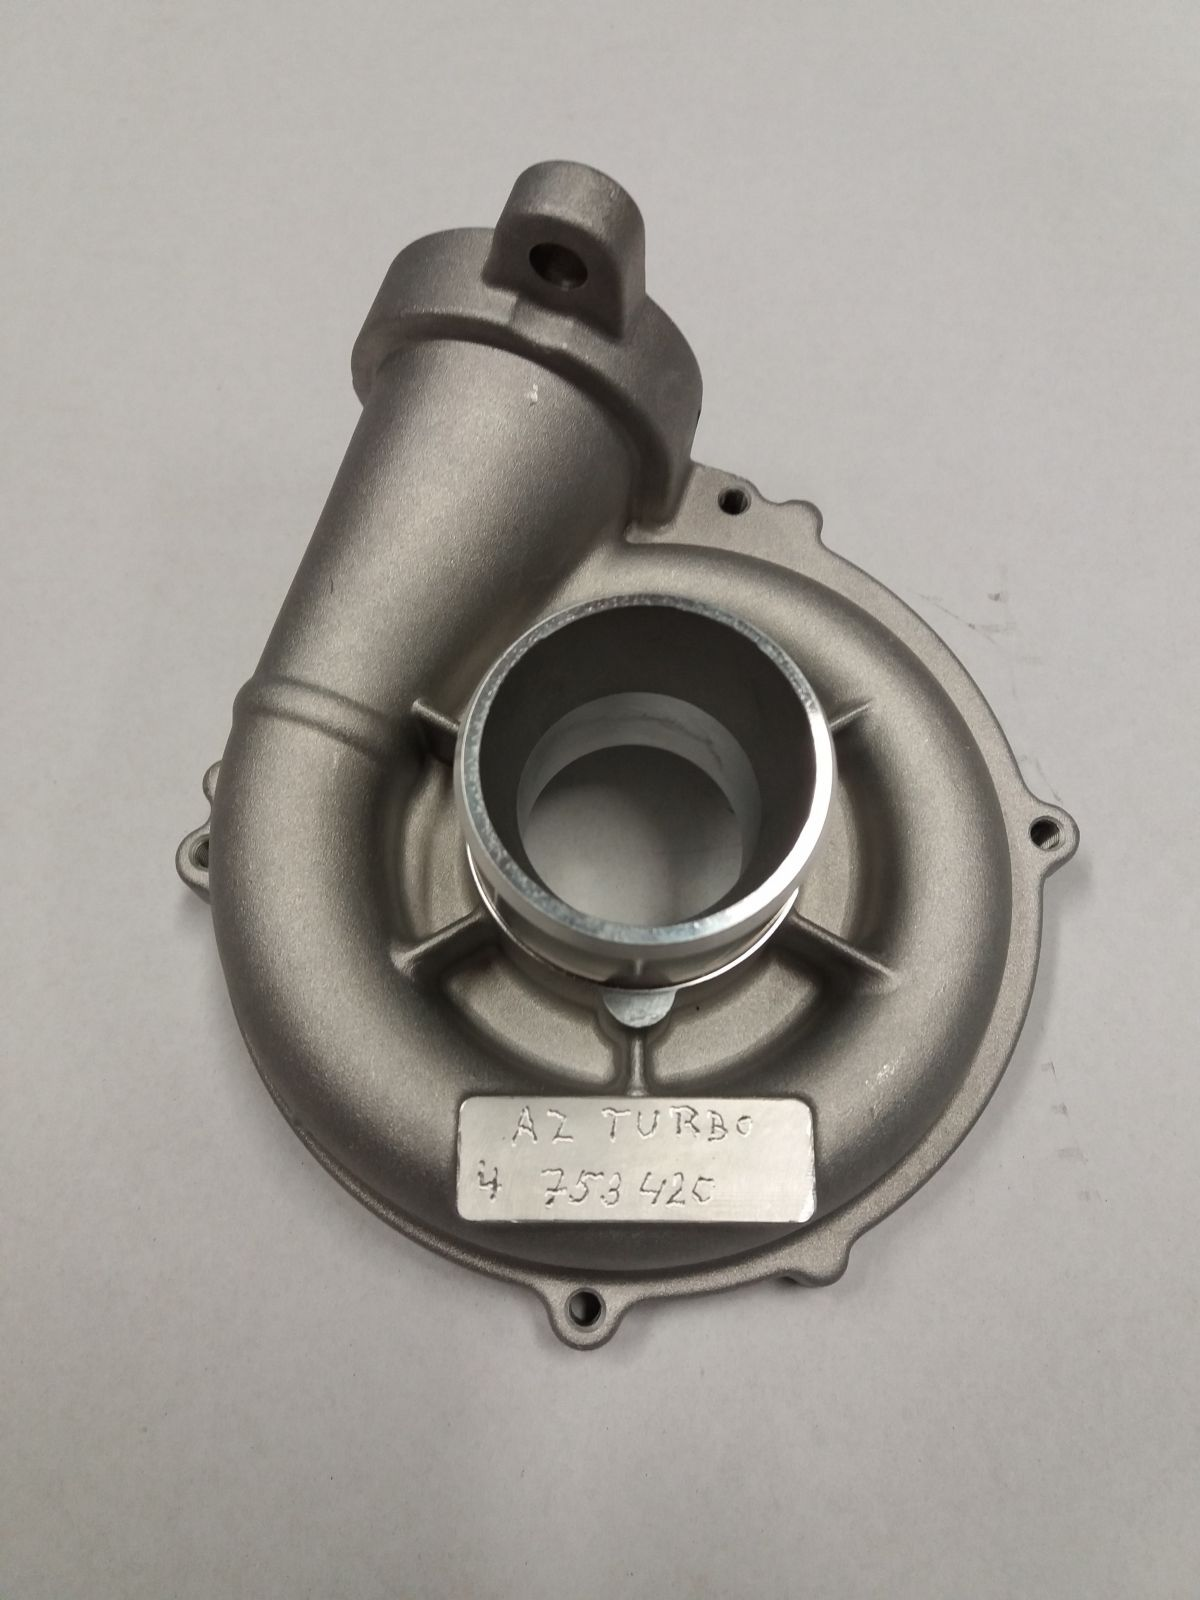 Sací komora turbodmychadla Citroen C2 1,6HDi, 80kW, r.v. 05-, Motor: DV6TED4 GARRETT